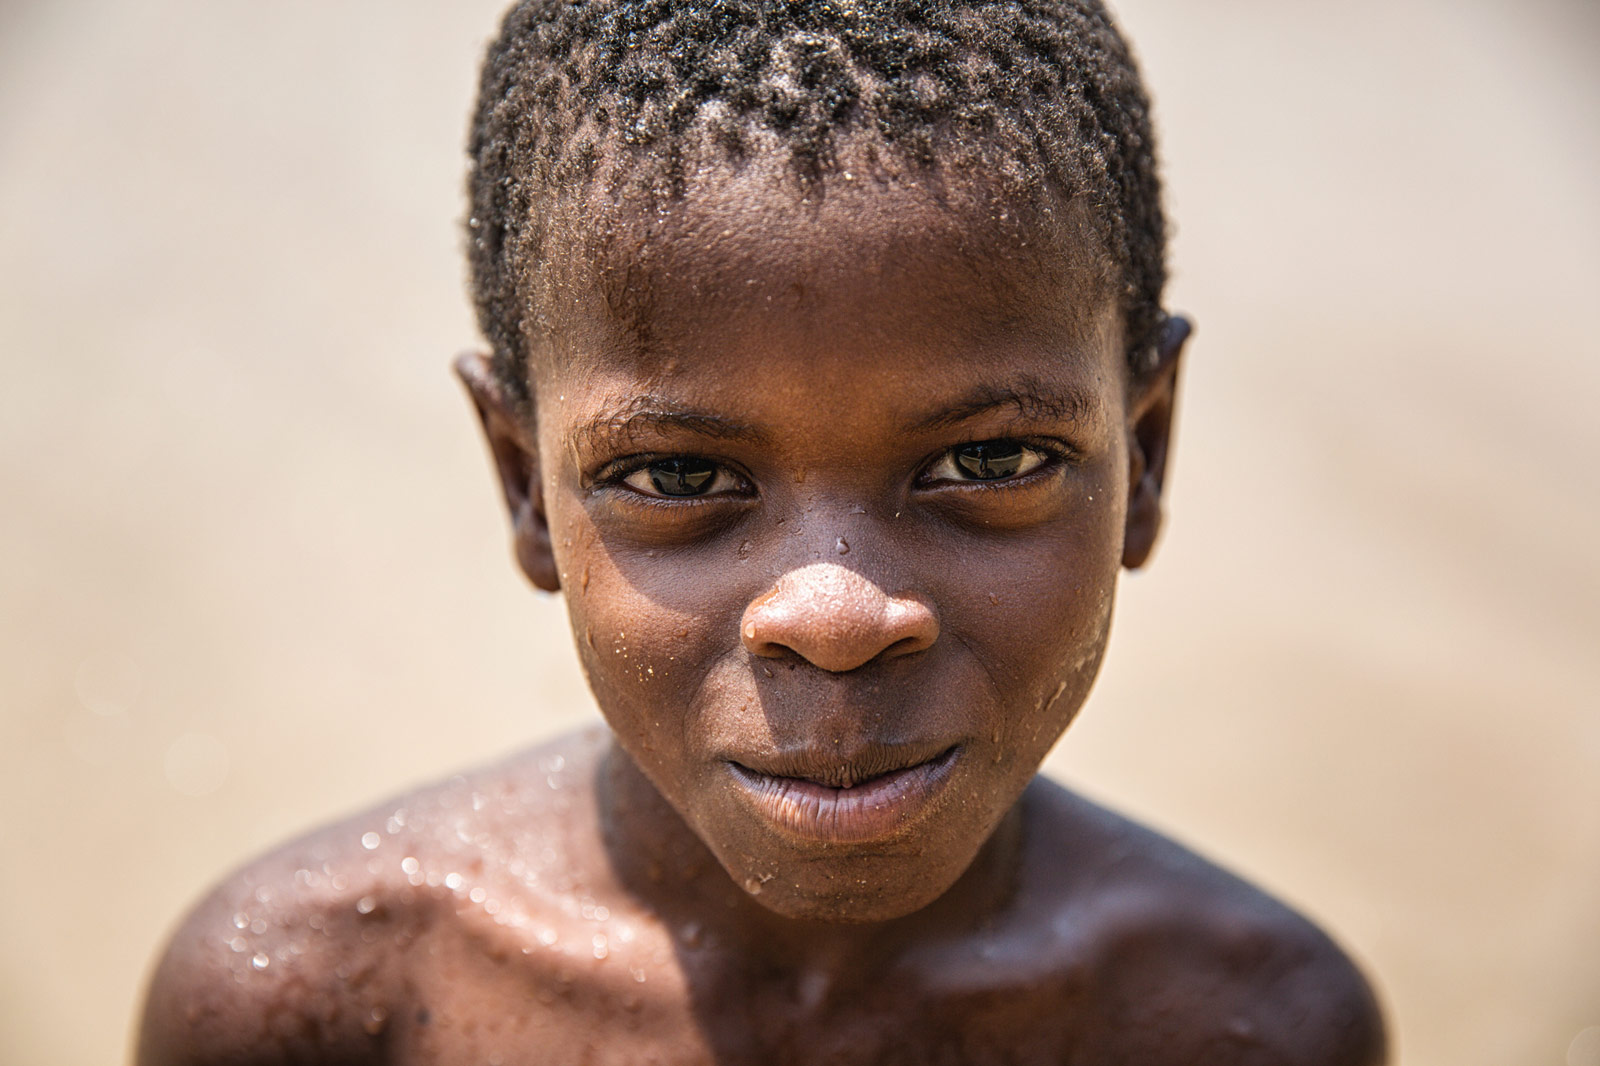 young-island-boy-sao-tome-Artur-Cabral-CZ3B9425-Editar